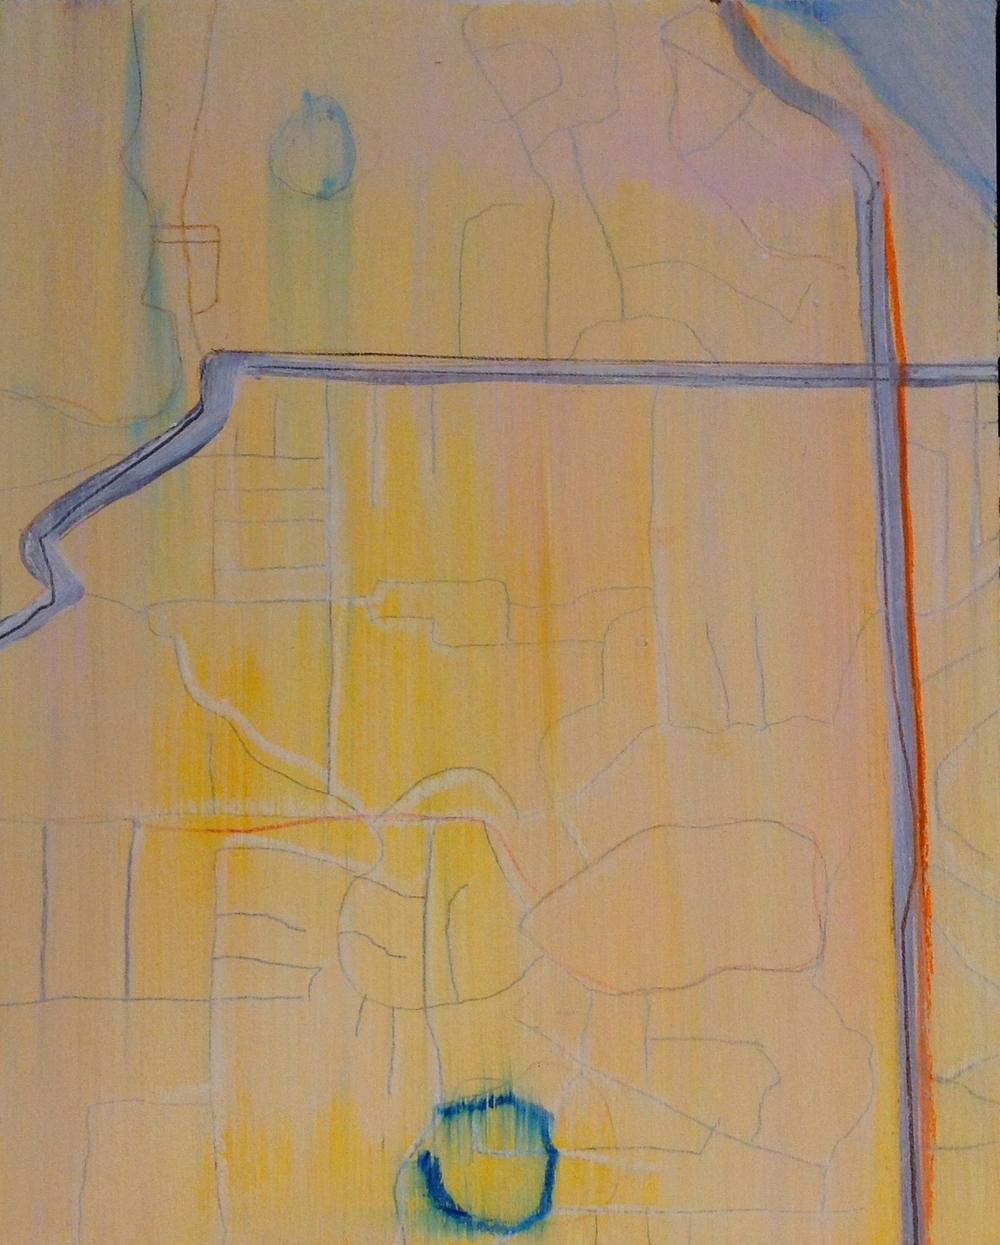 Artmap Section #4